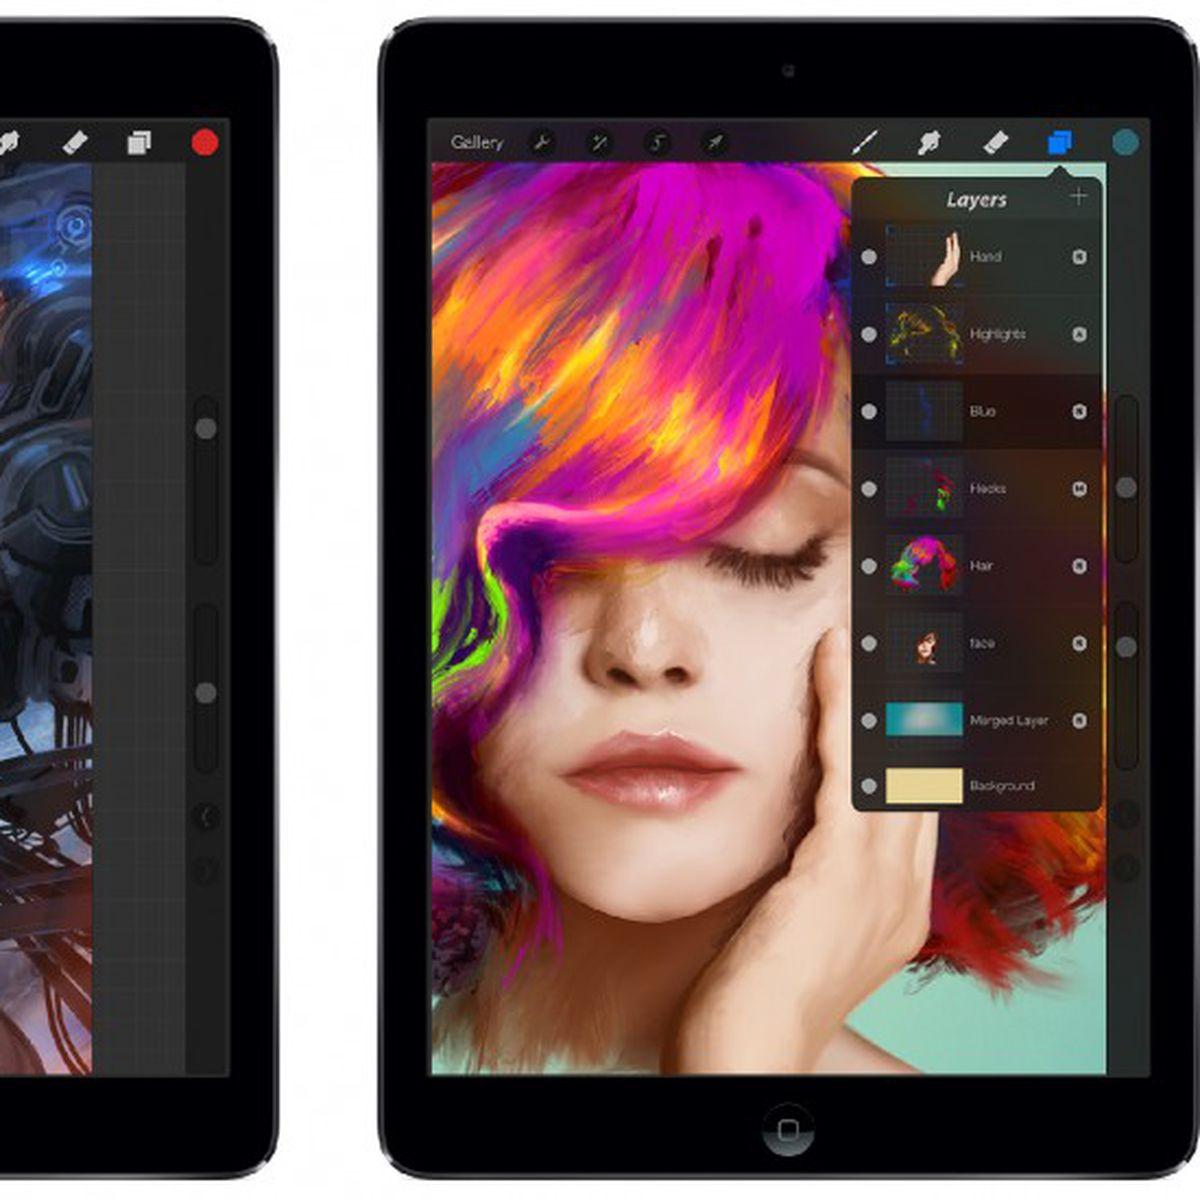 Ipad Illustration App Procreate Adds Support For 64 Bit A7 Processor 4k Ultra Hd Canvas Size Macrumors